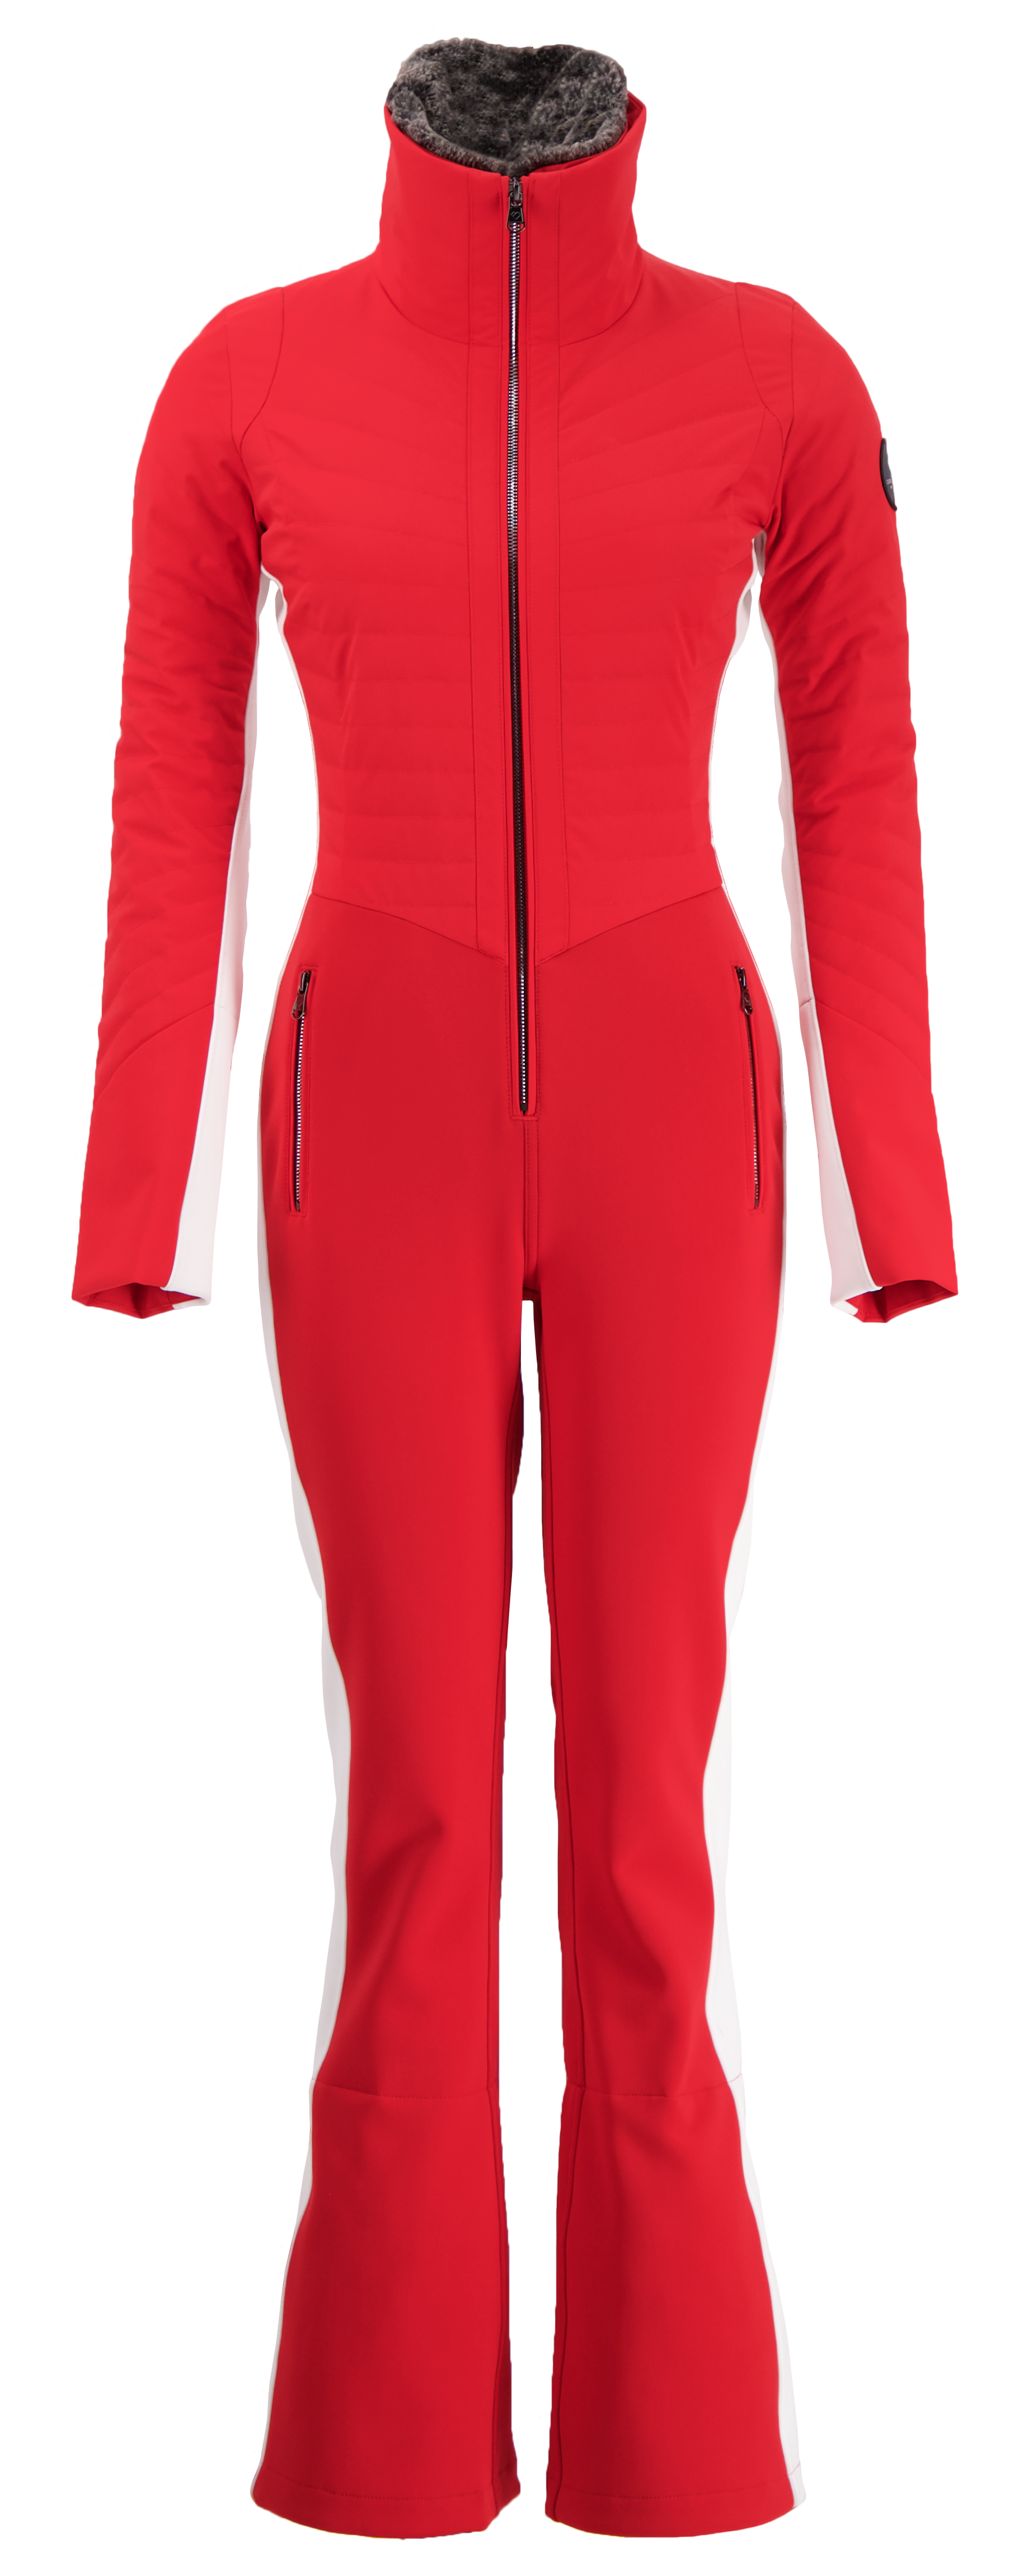 MARMOT ALPINIST GORE-TEX® Pro Shell Jacket